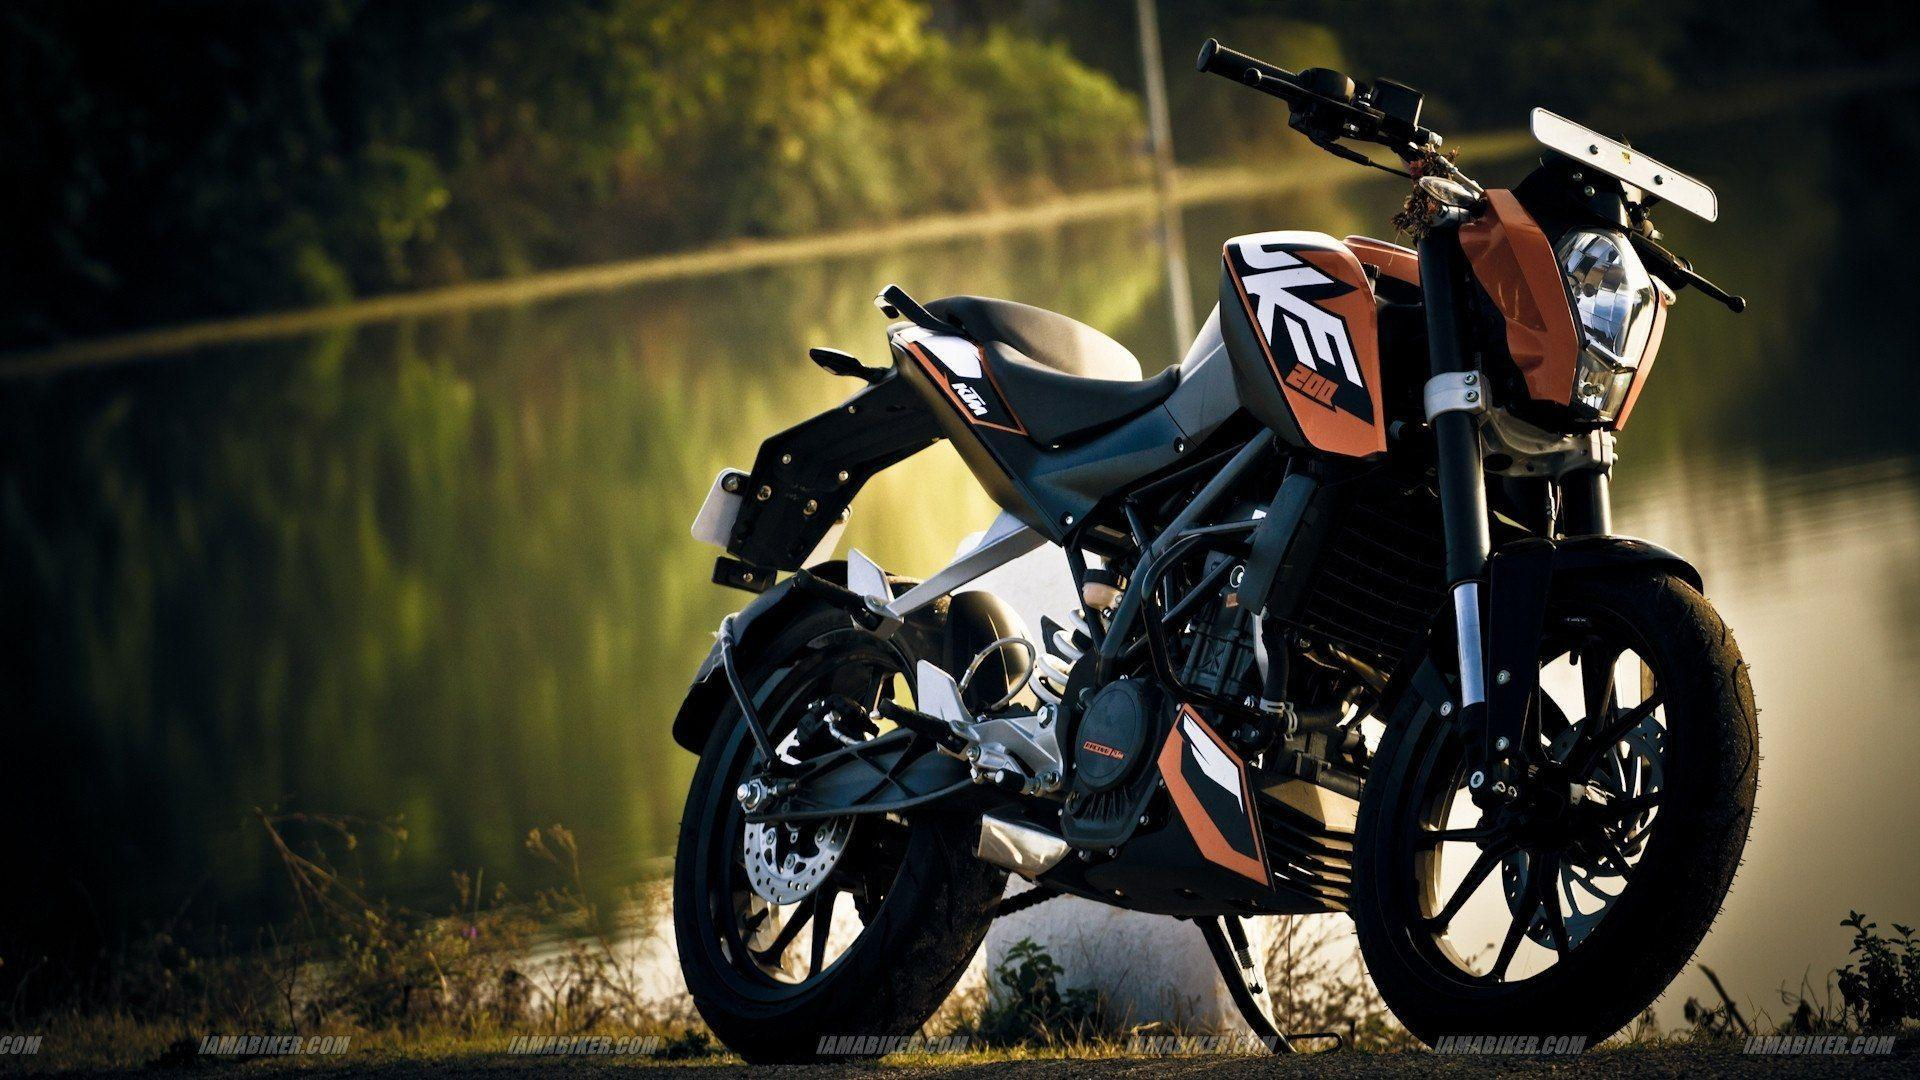 KTM Bike Wallpaper HD - CuteWallpaper.org